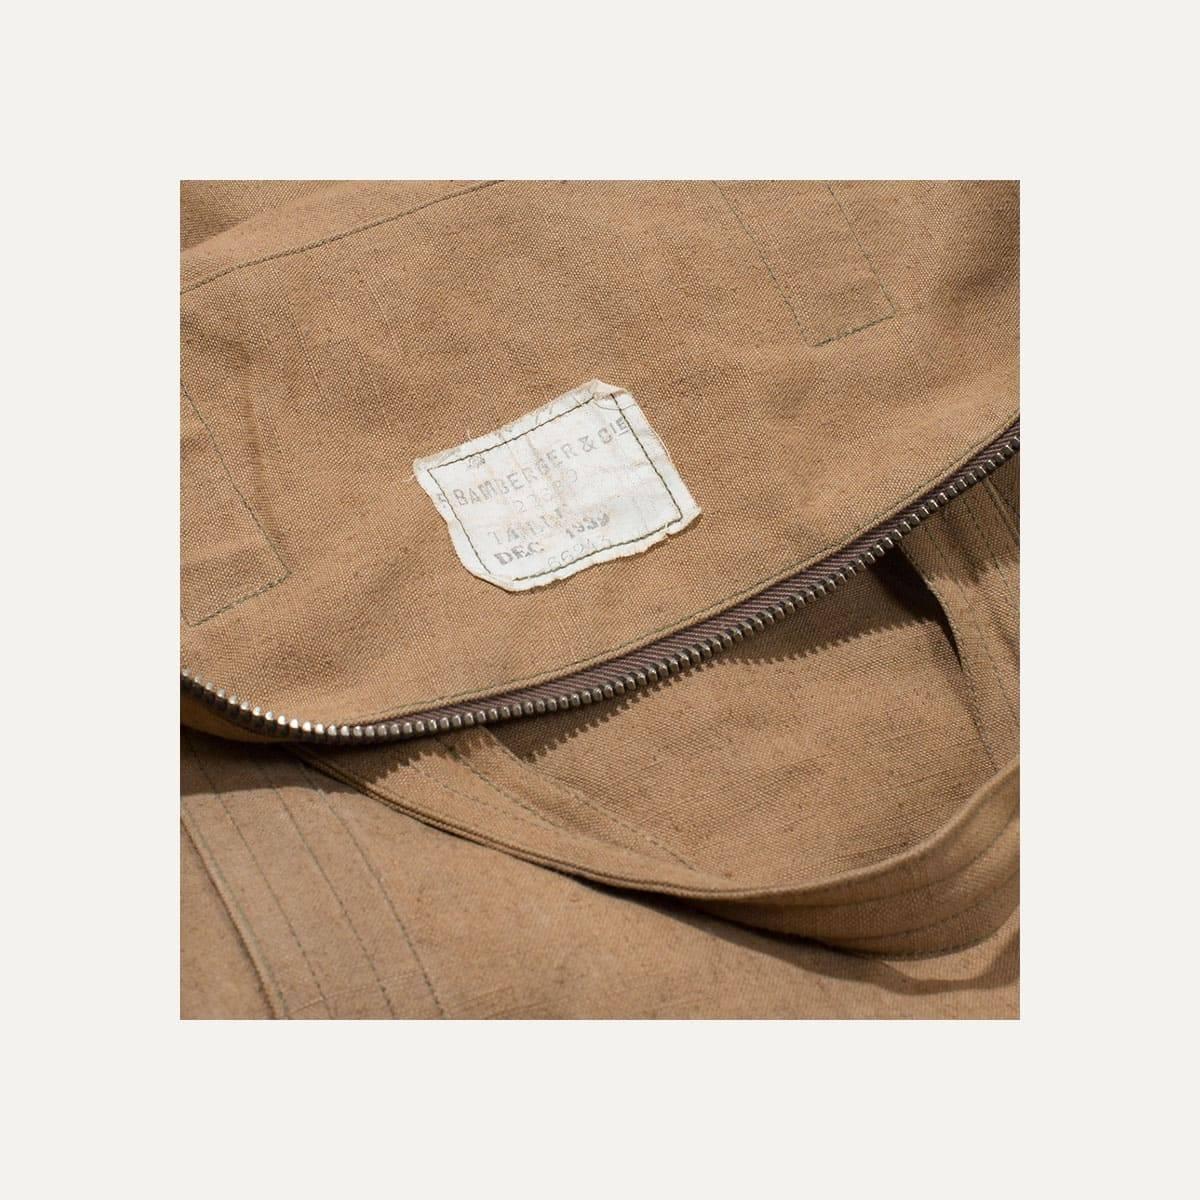 N°4: 'Cashew-colored' linen parachute bag (image n°4)